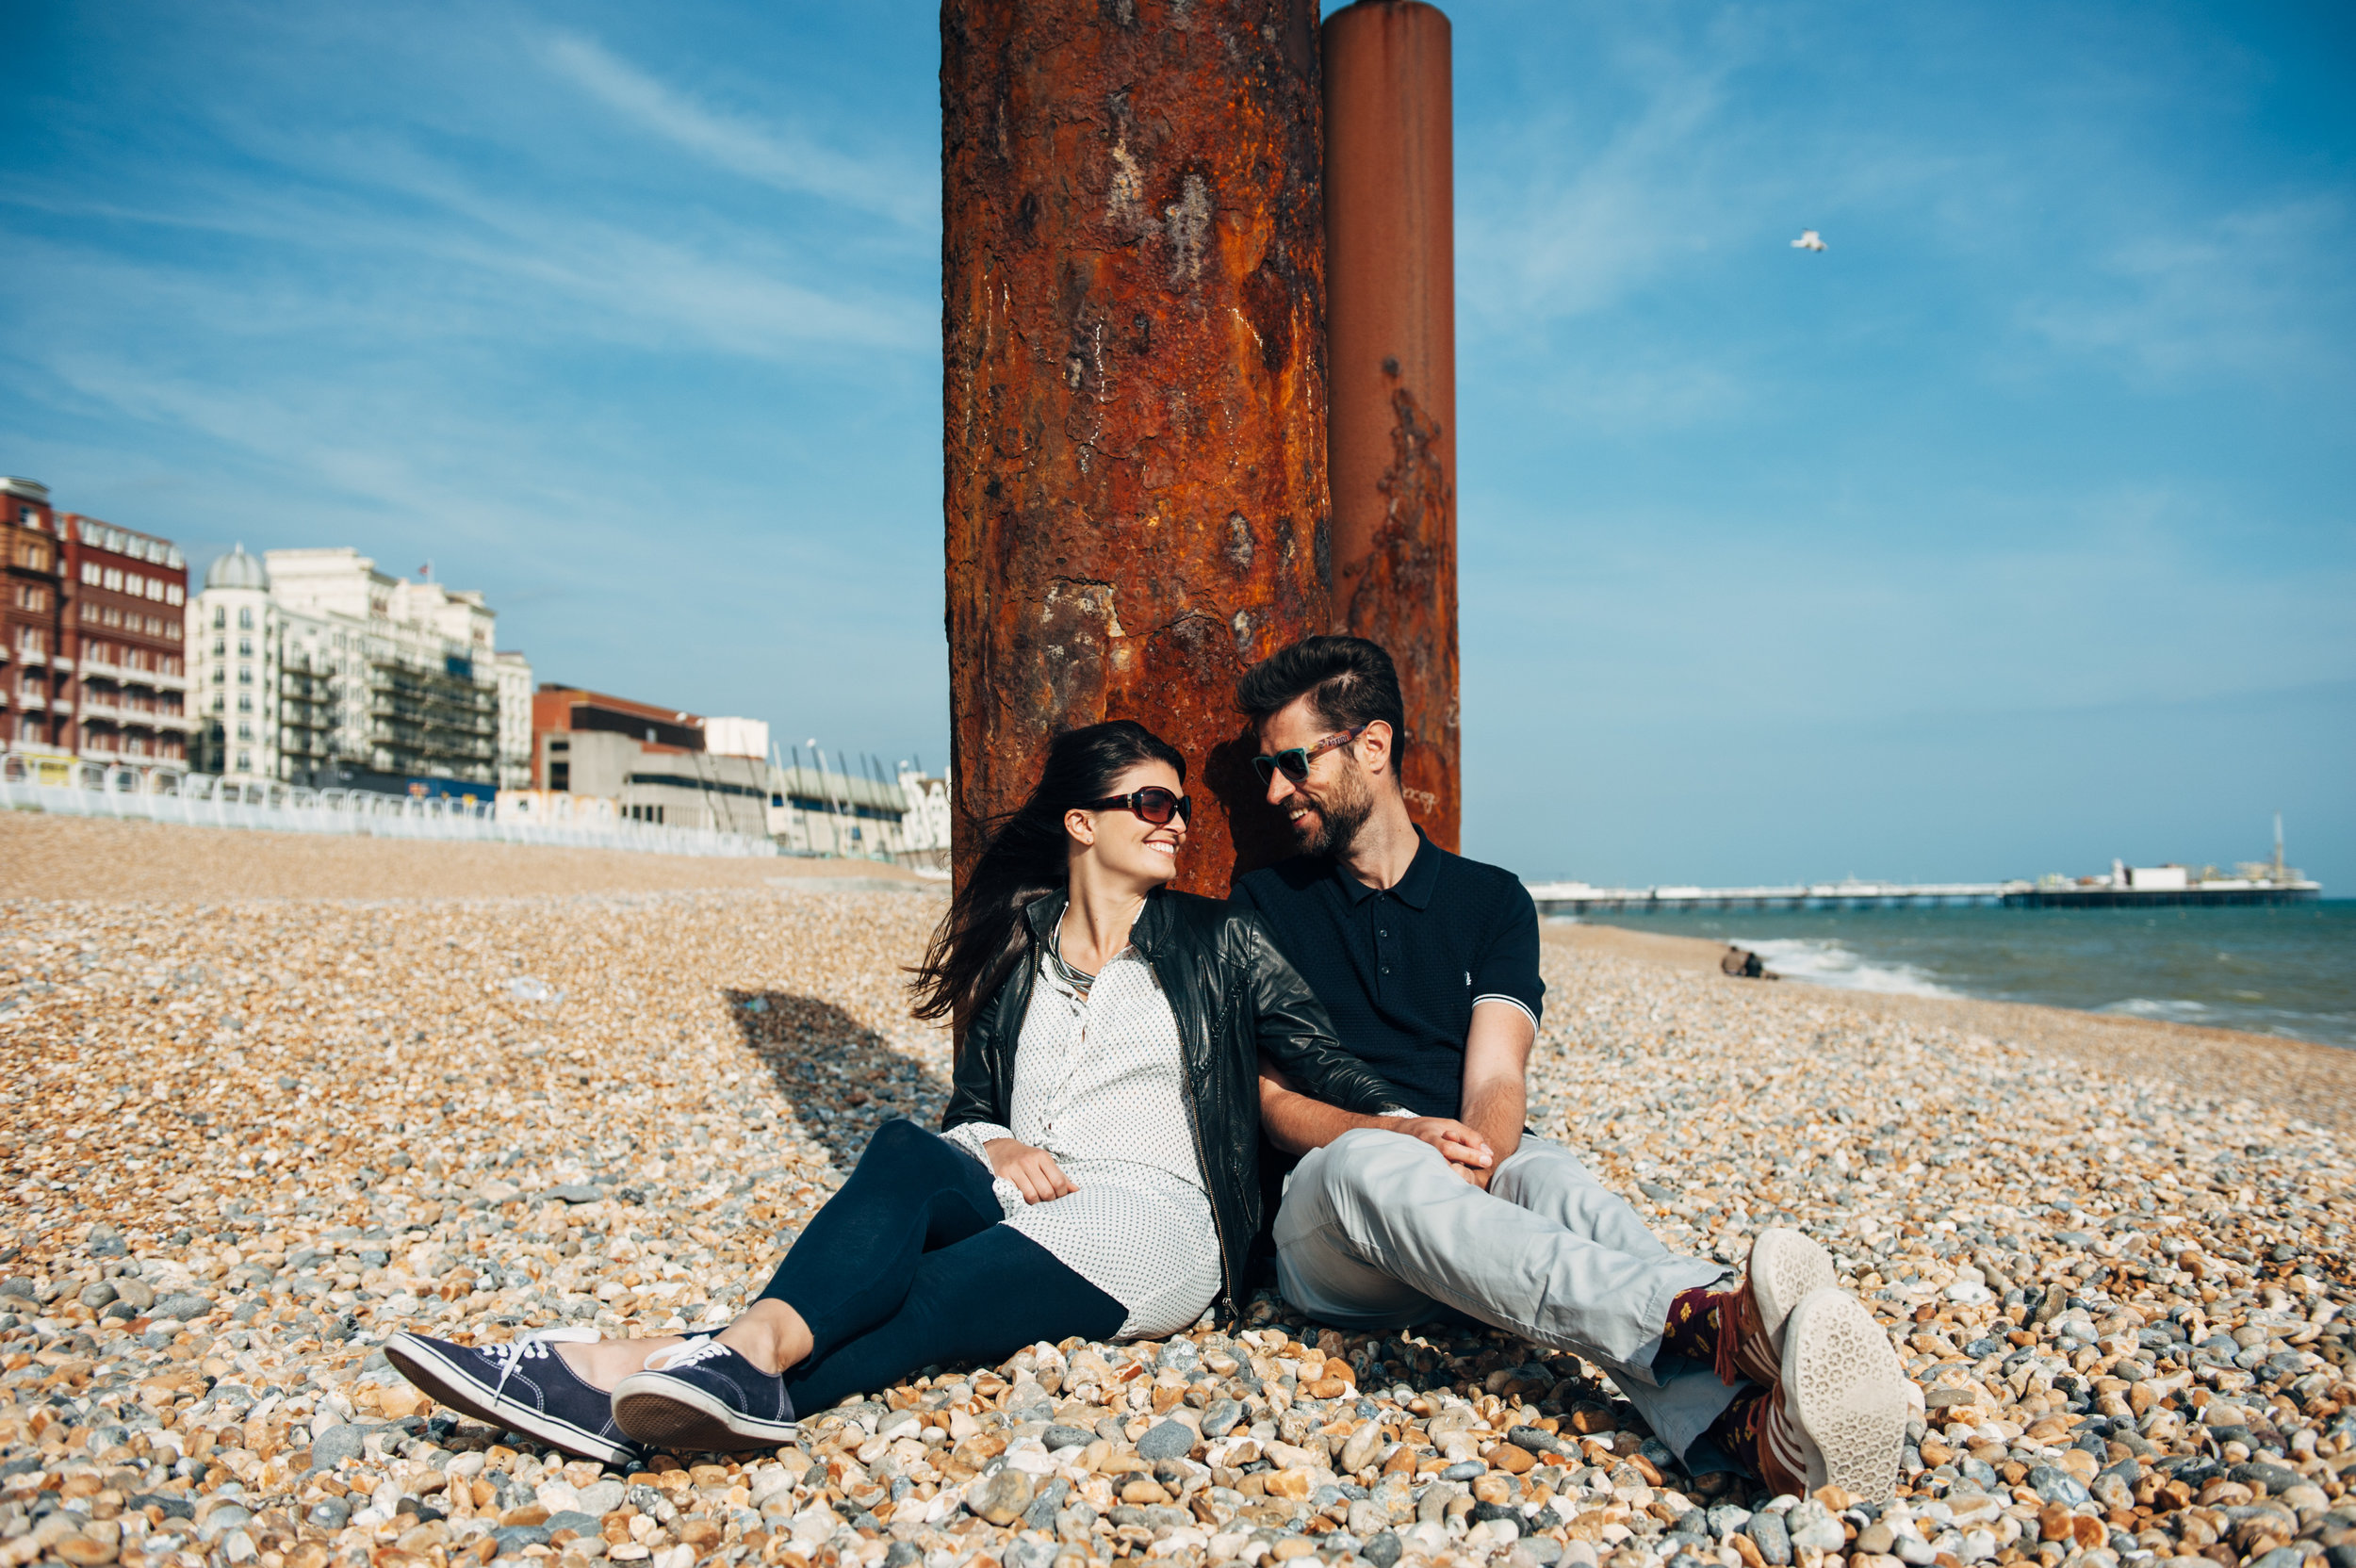 Their Engagement Photos - in Brighton